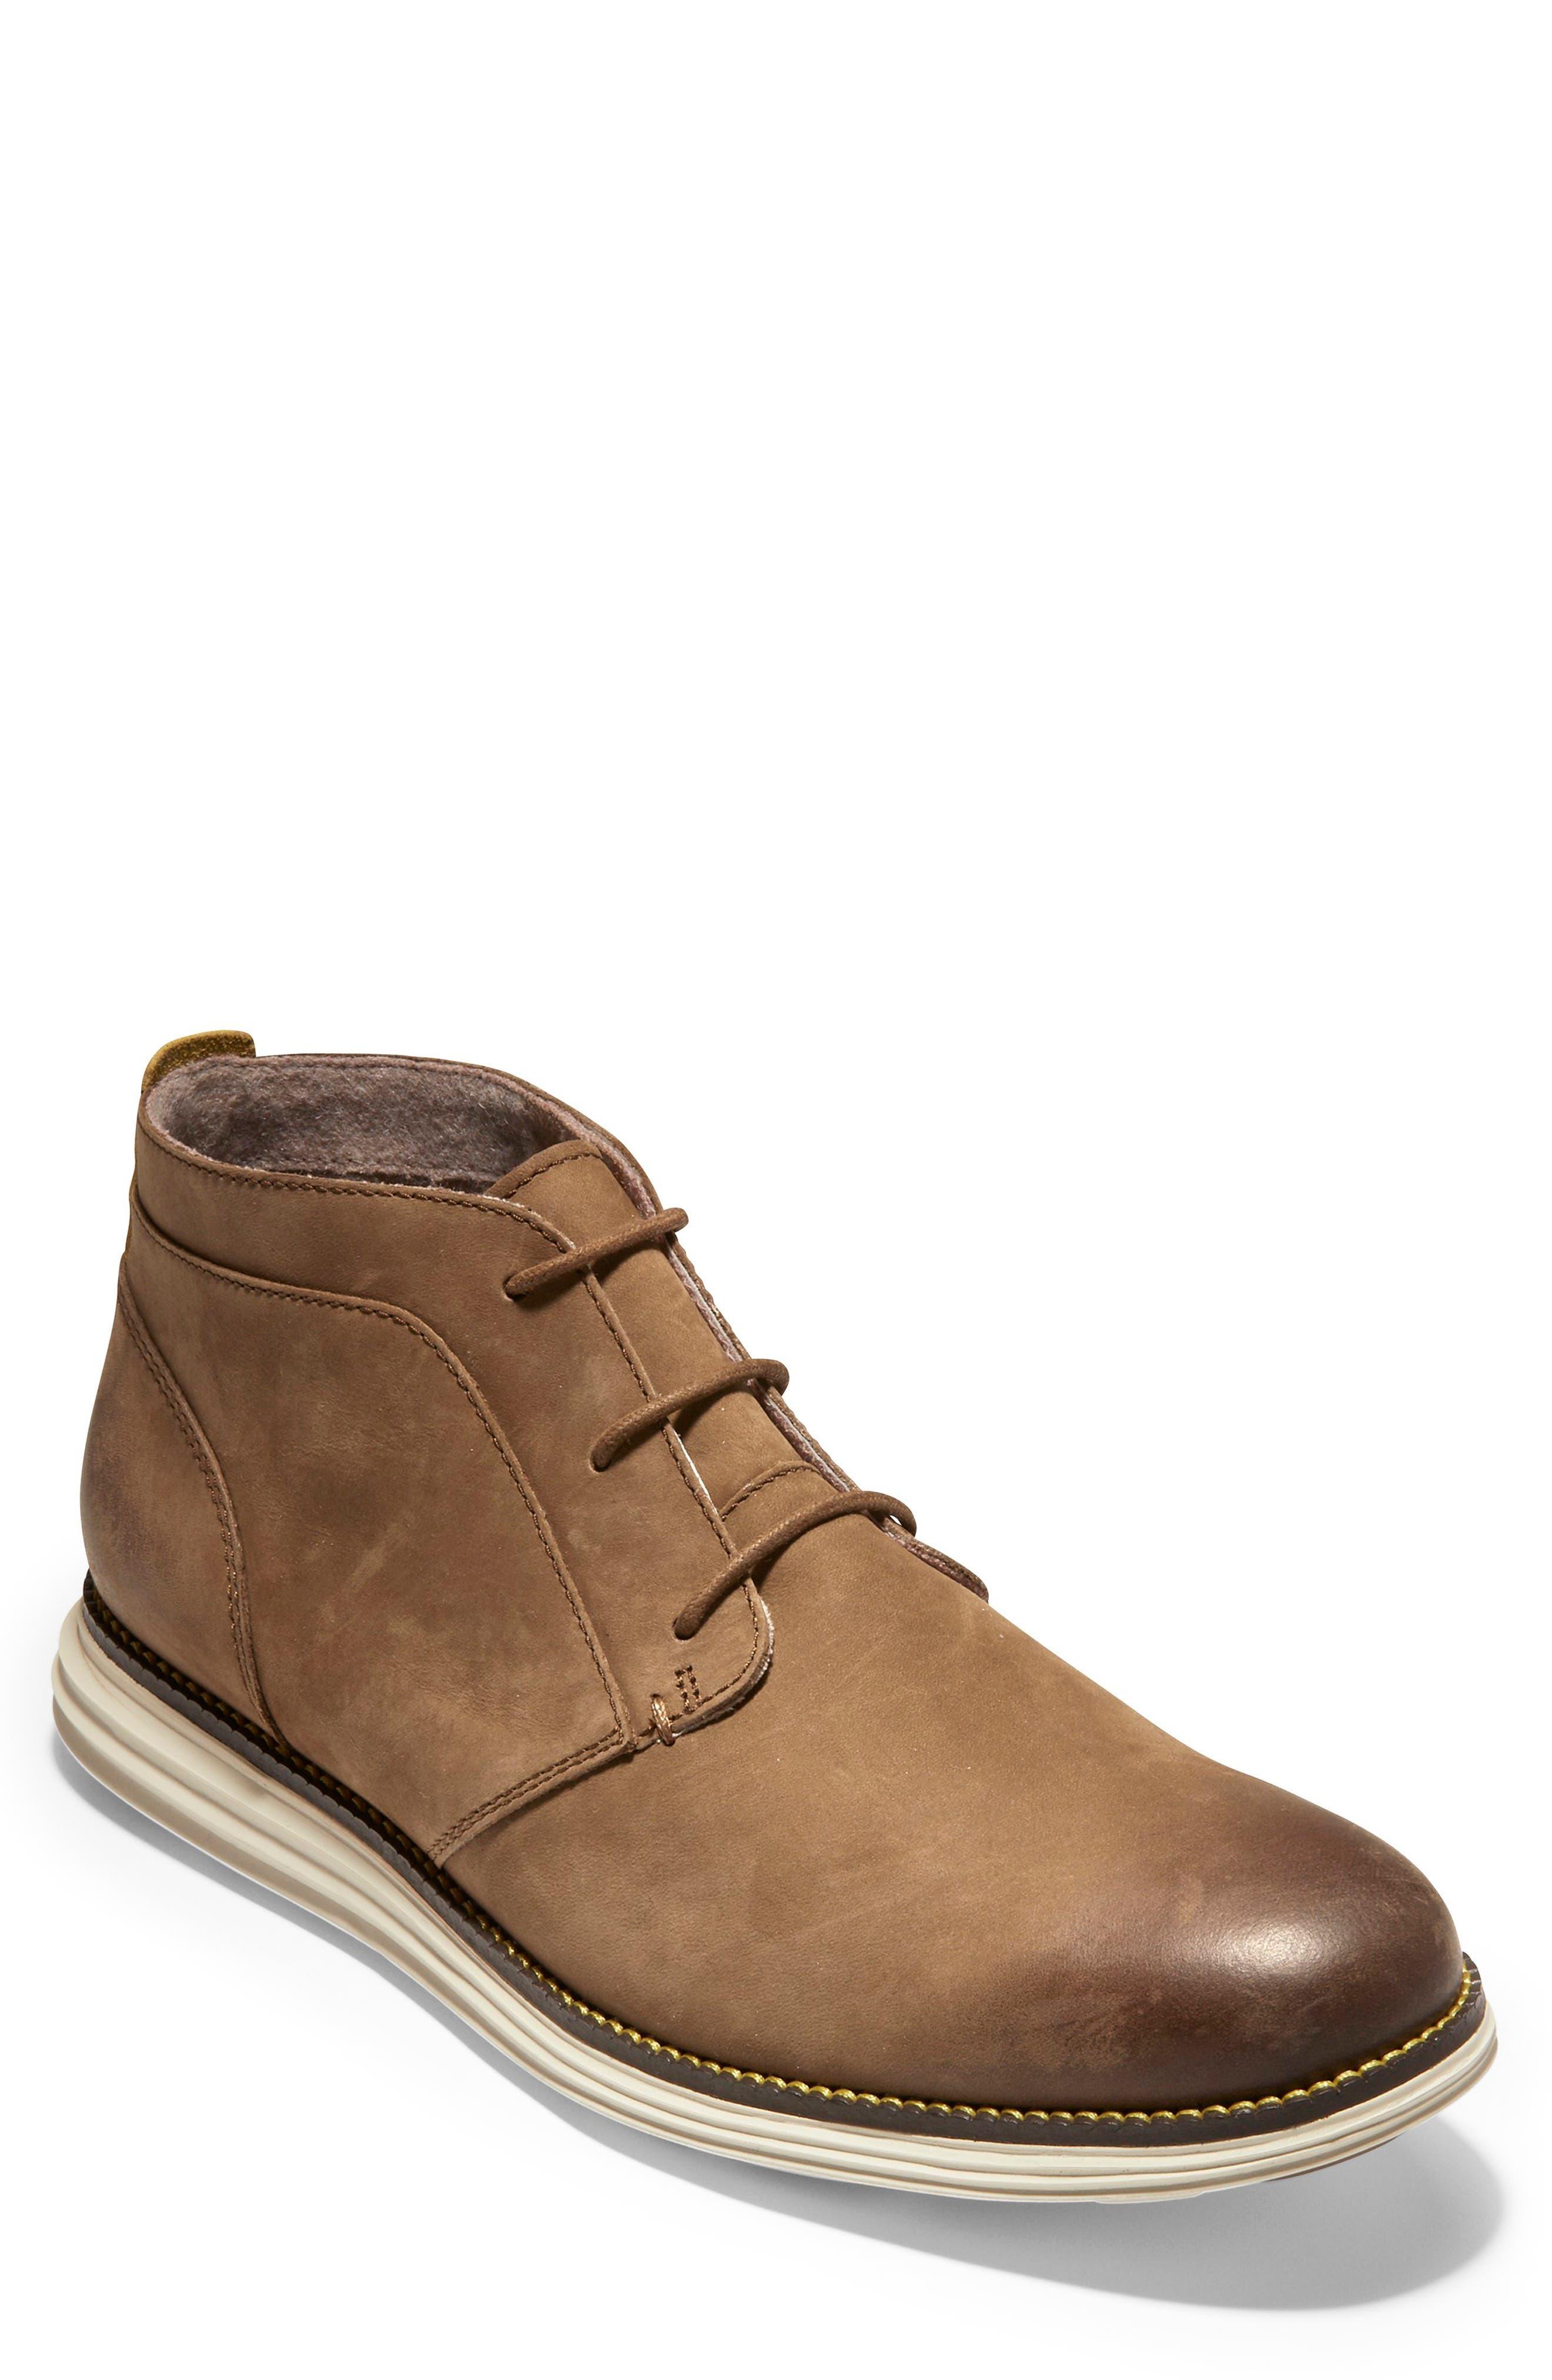 Cole Haan Boots Original Grand Chukka Boot